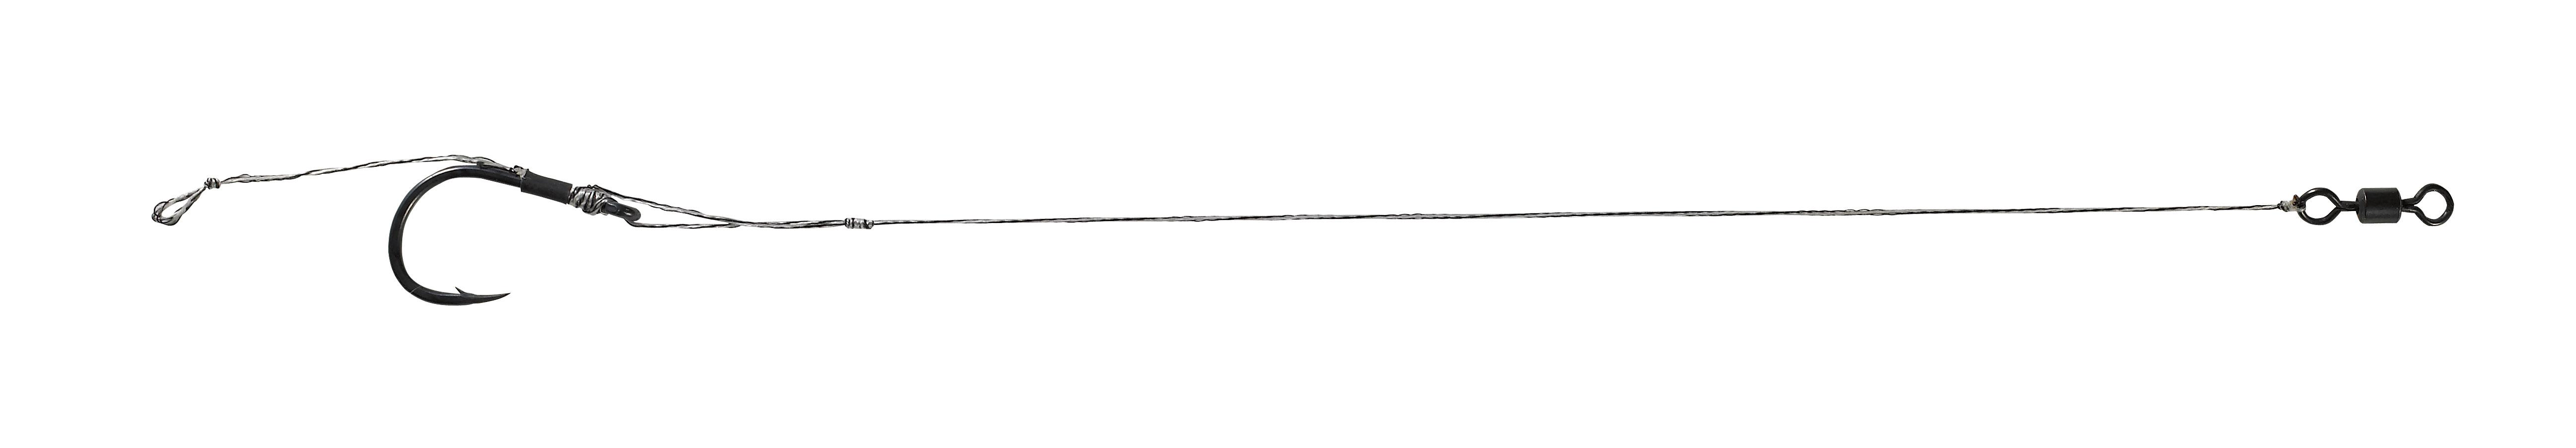 Nadväzec Anaconda Adjustable Hair Rig bez protihrotu č.4